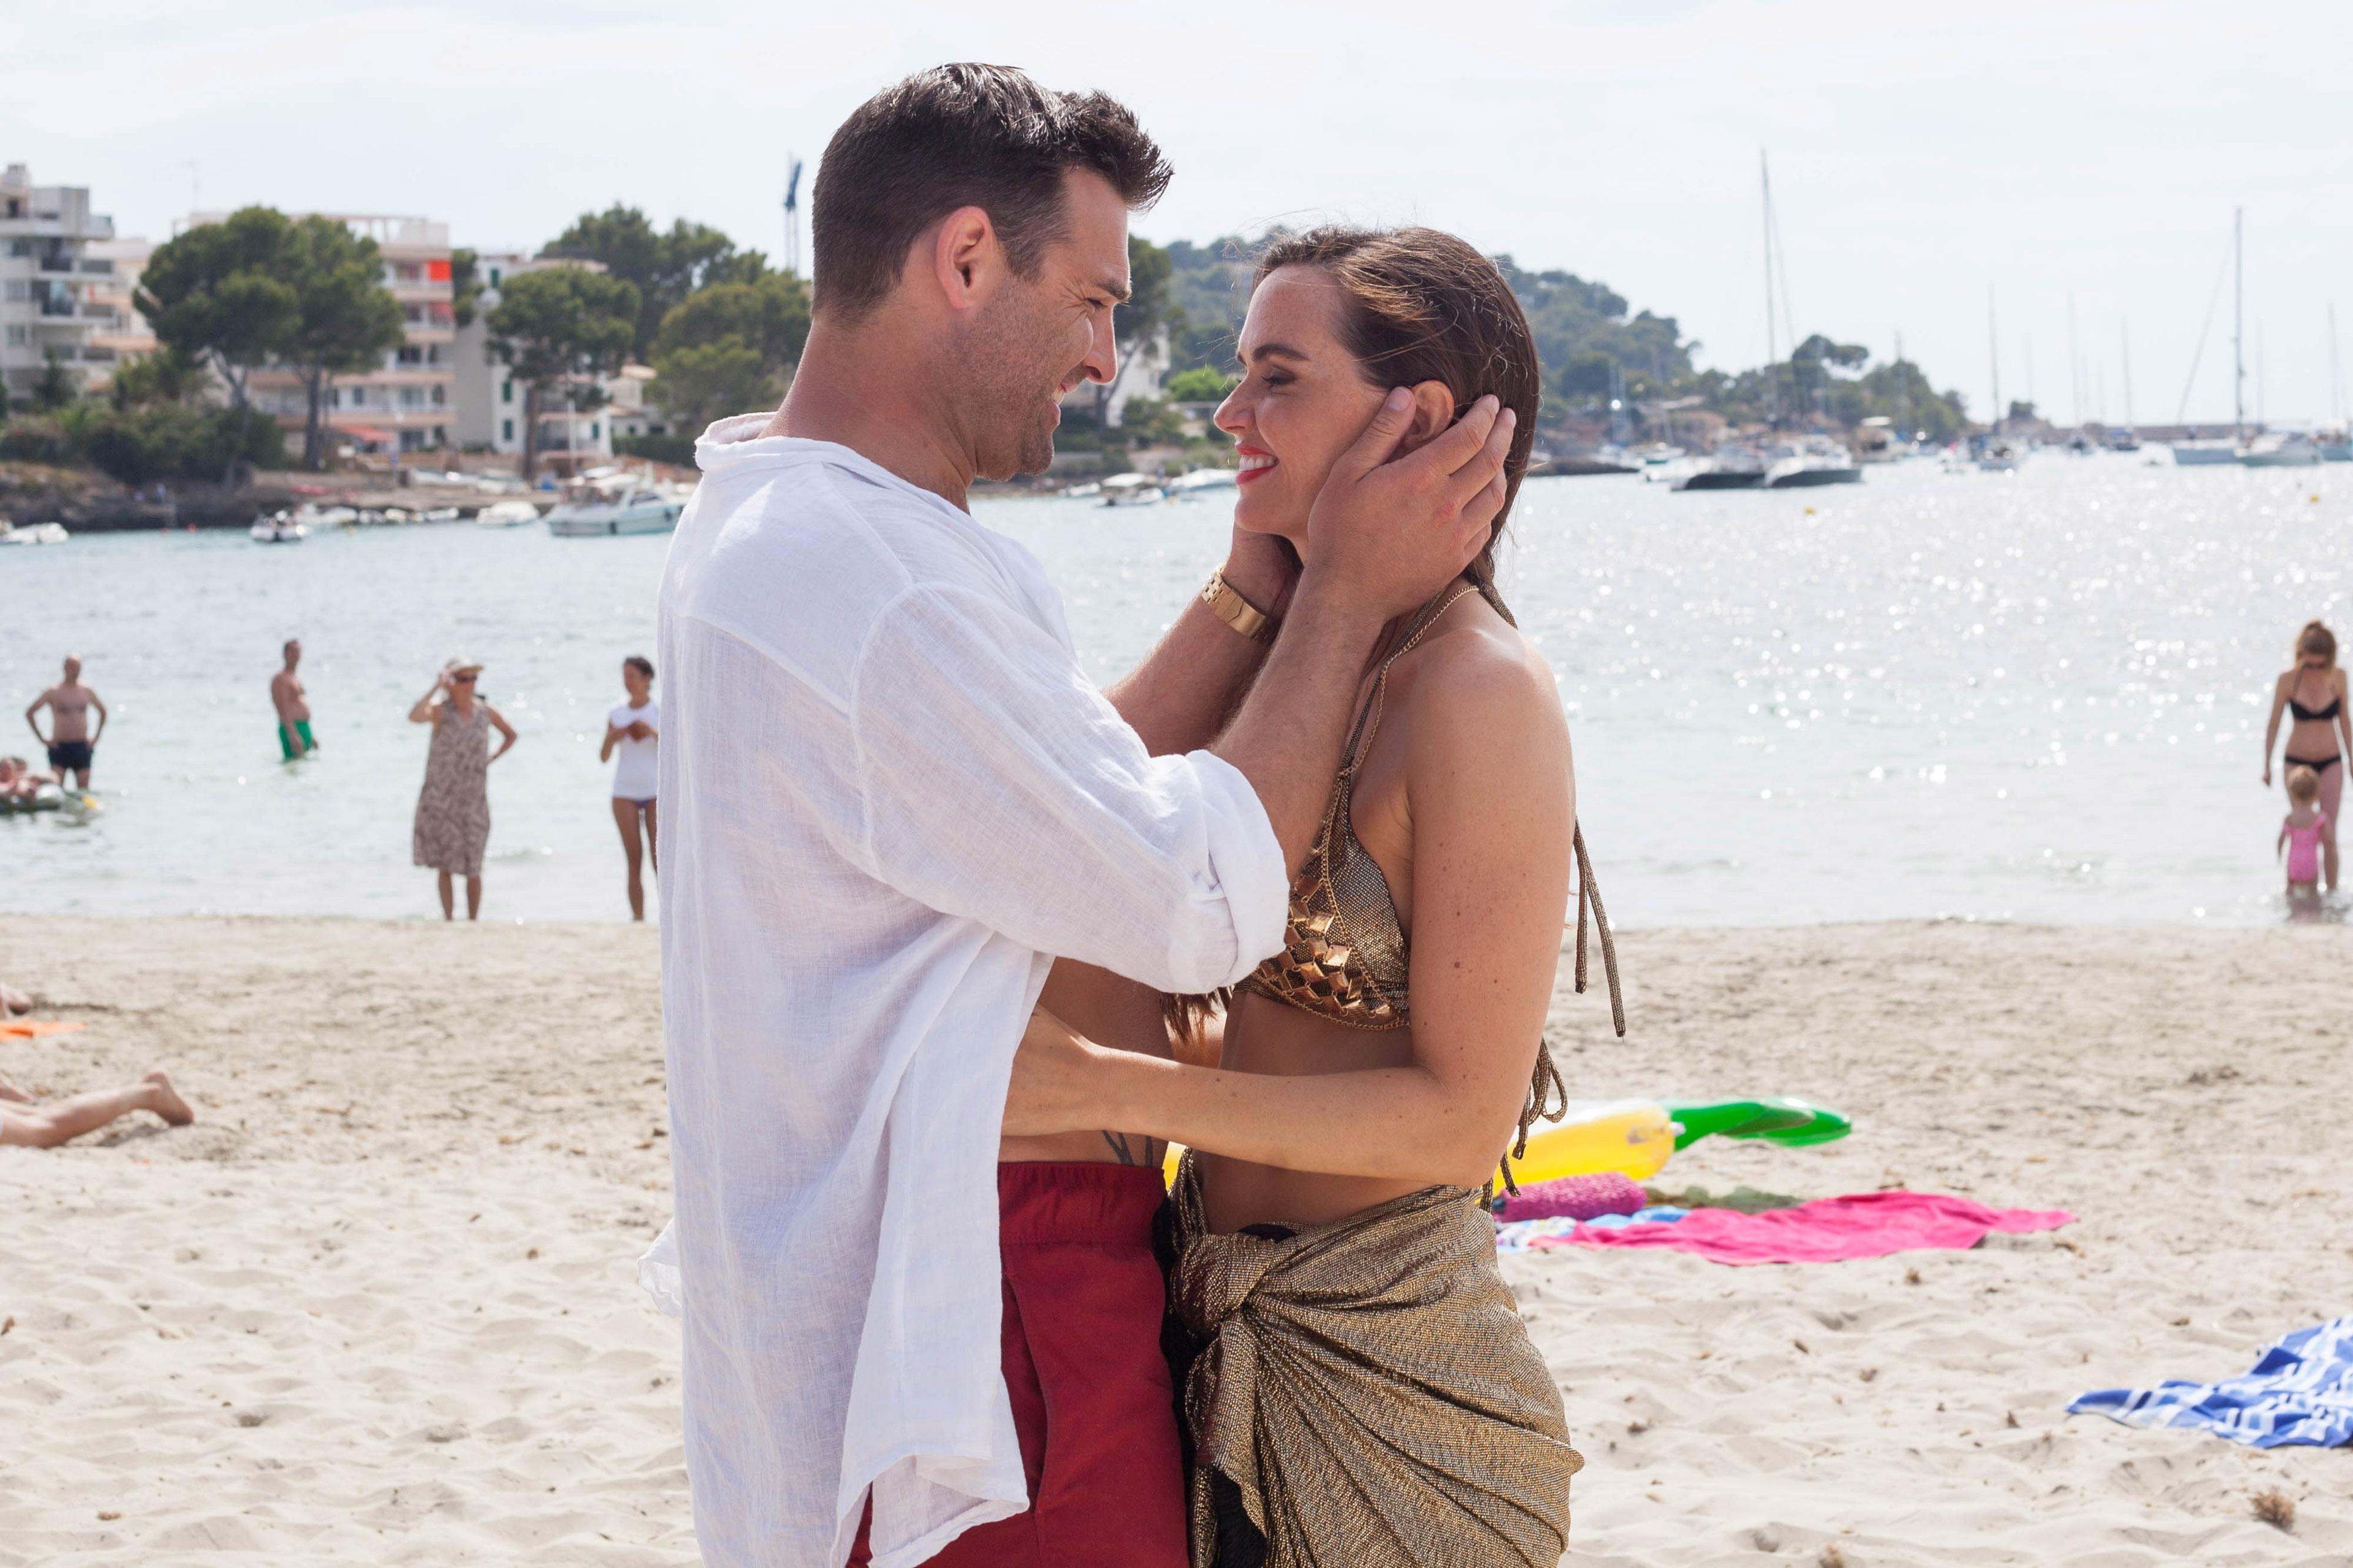 Hollyoaks spoilers: Mercedes McQueen is marrying Russ Owen